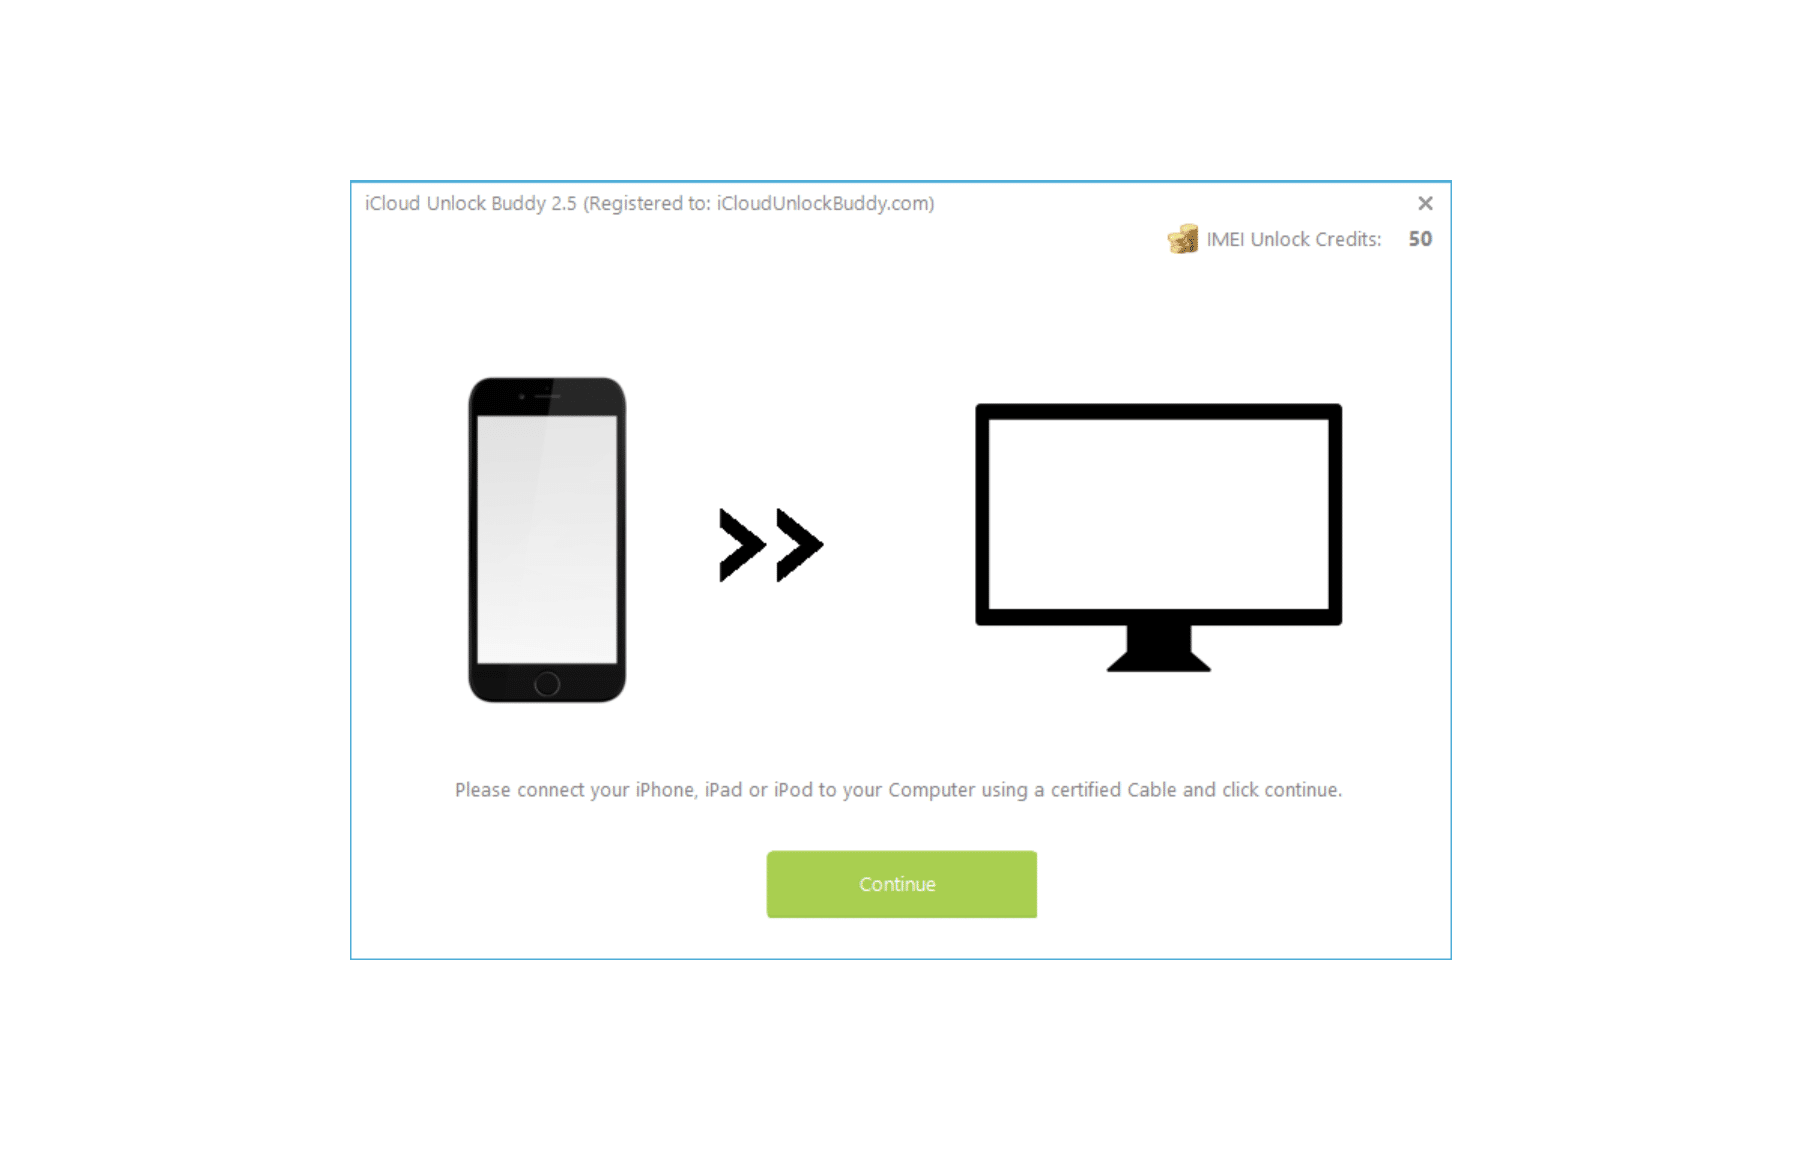 Best Free iCloud Unlock Buddy Alternatives to Unlock iCloud Lock